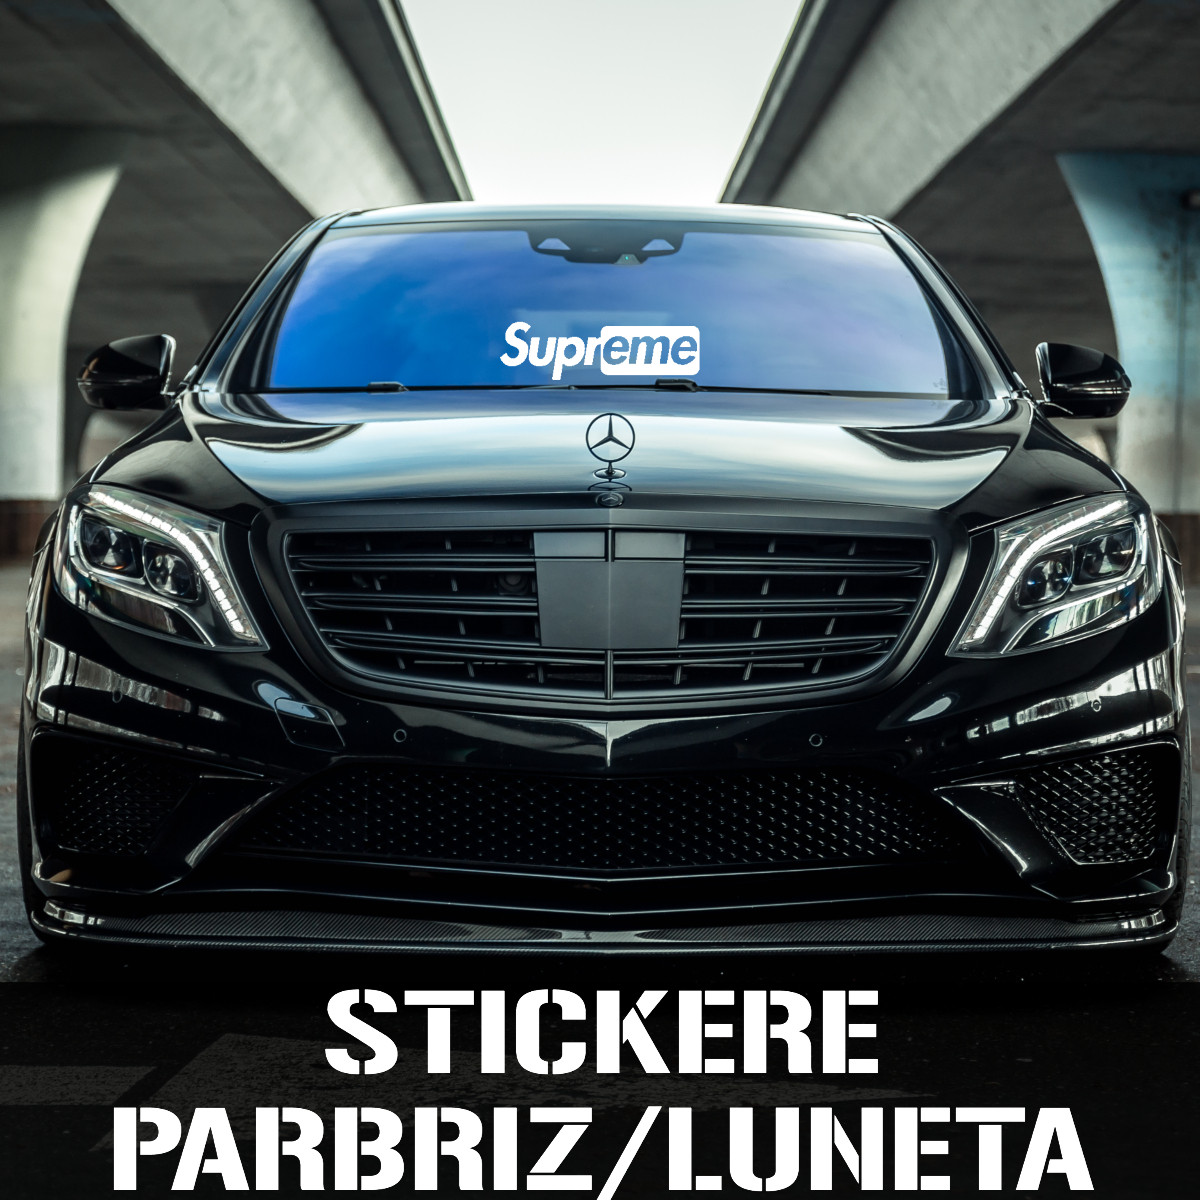 Stickere si abtibilduri auto parbriz si luneta